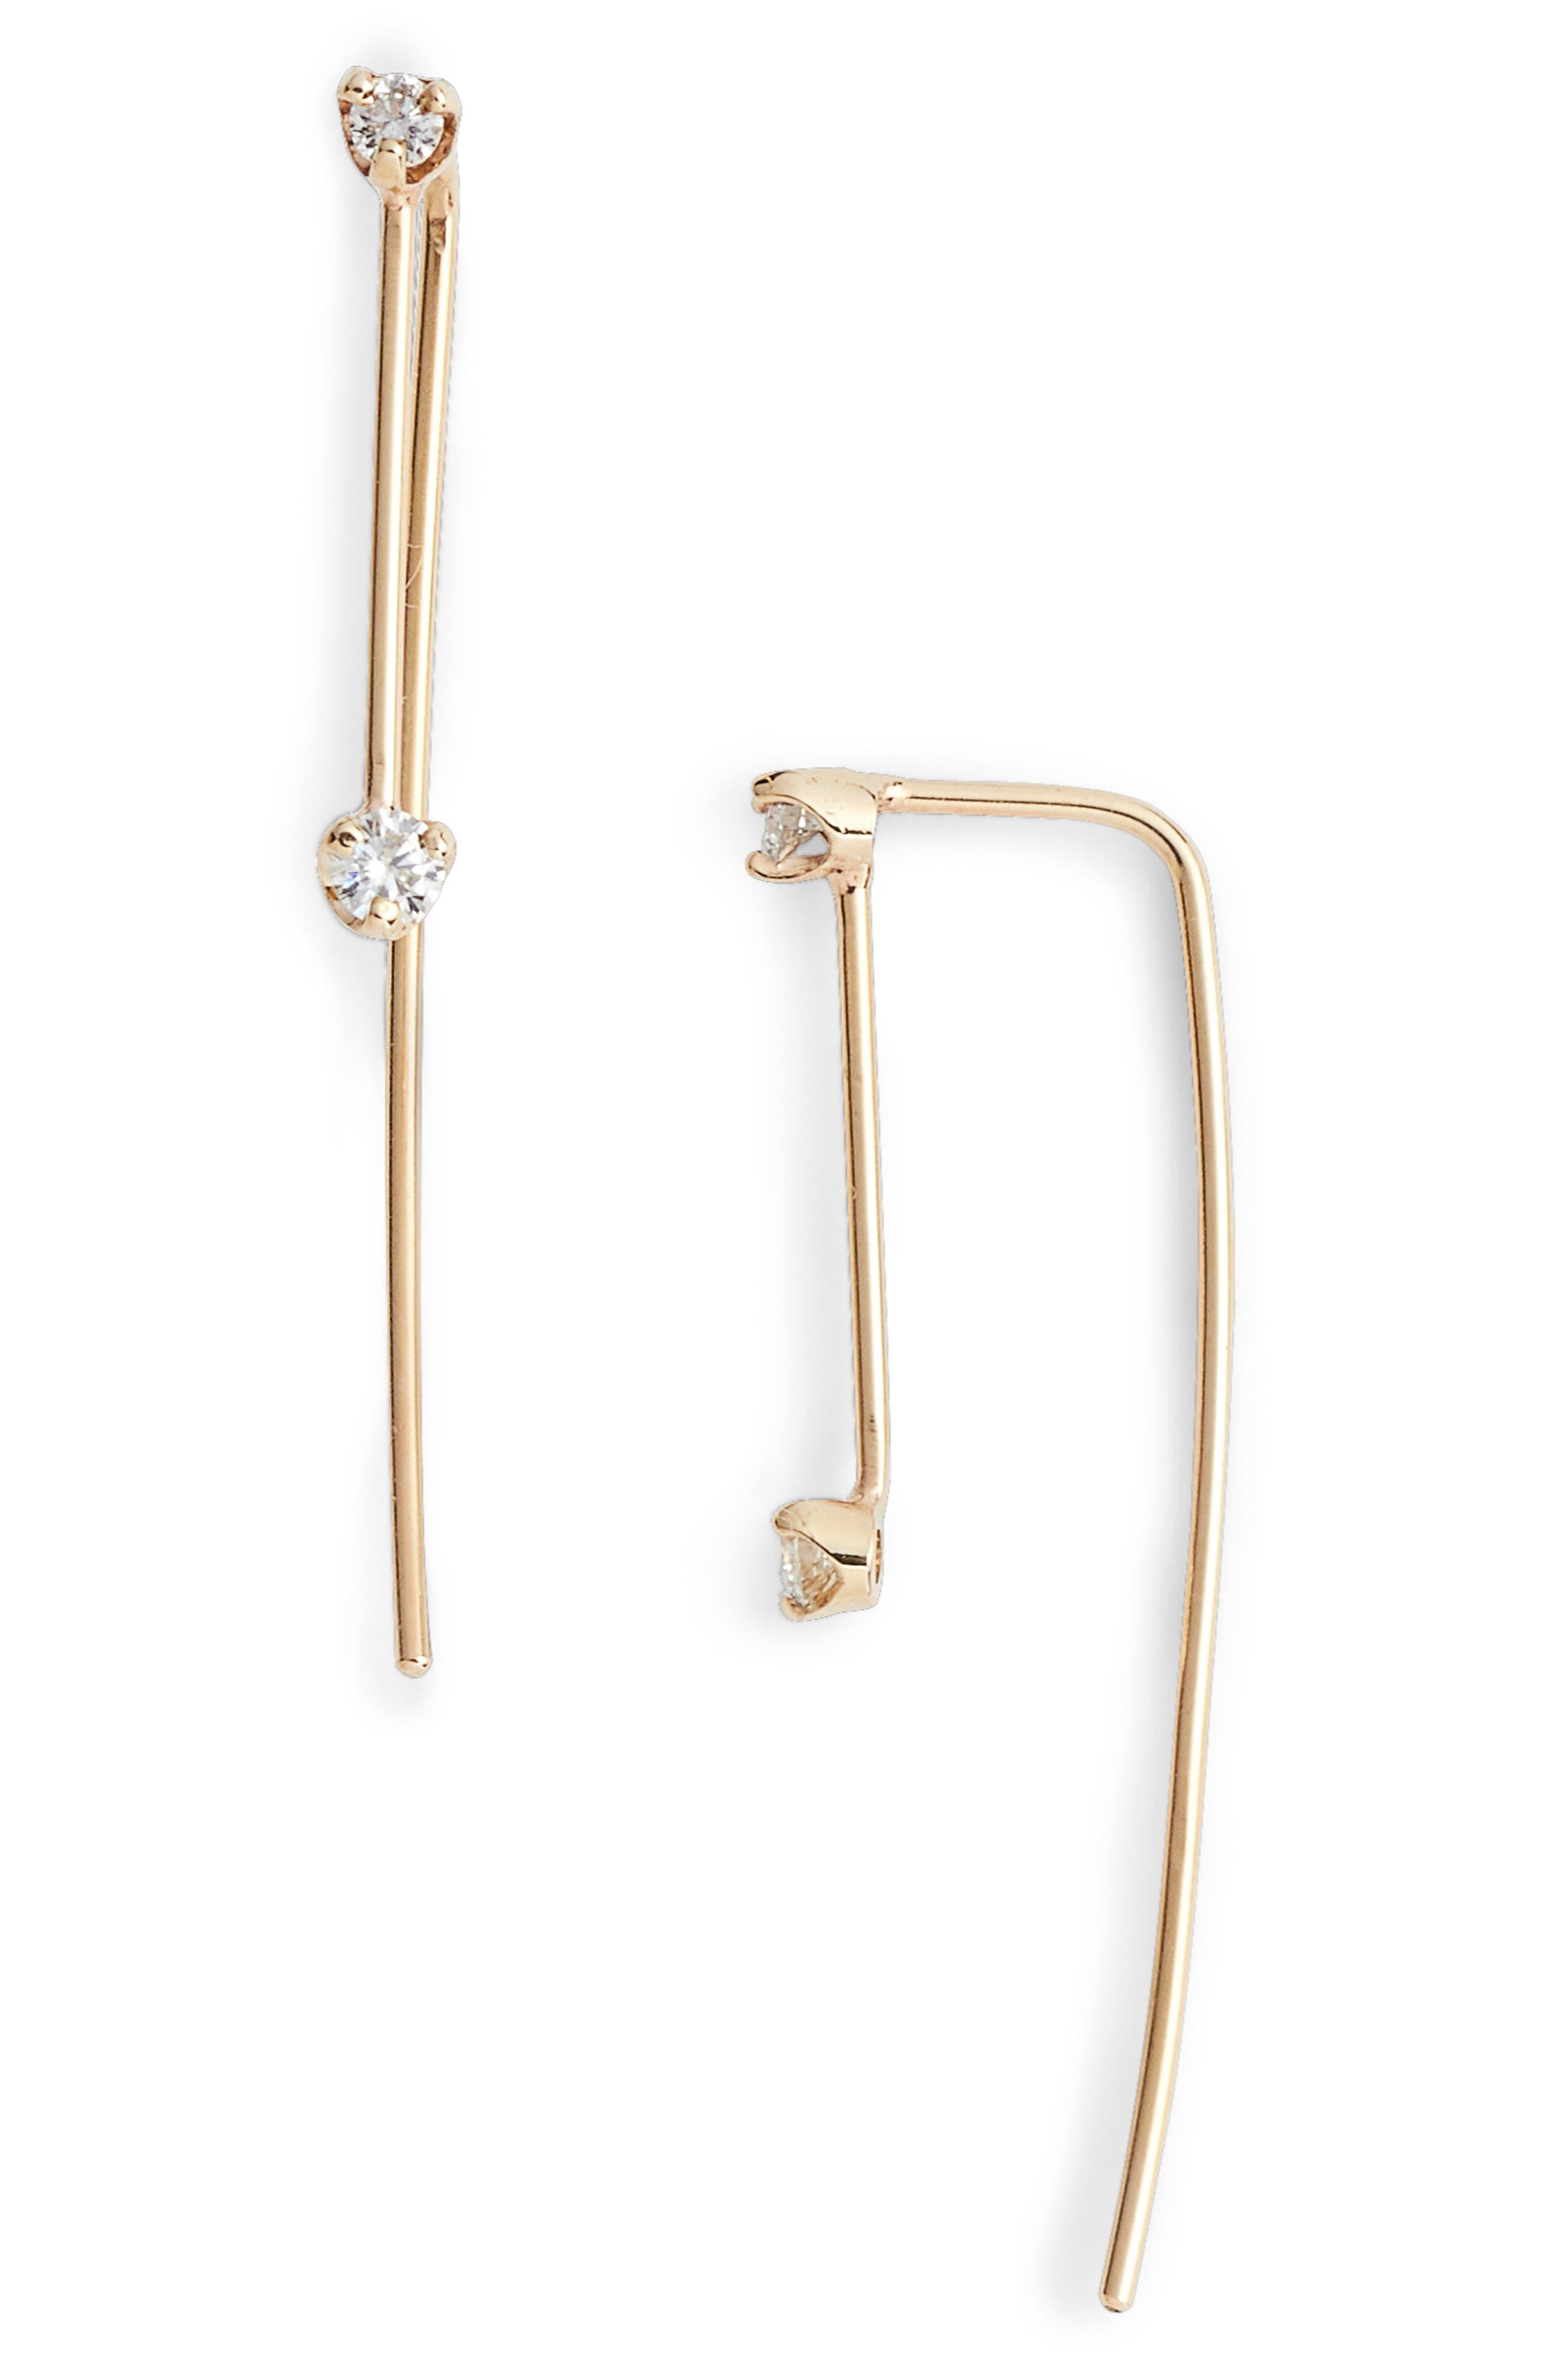 Double Diamond Threader Earrings,                             Main thumbnail 1, color,                             YELLOW GOLD